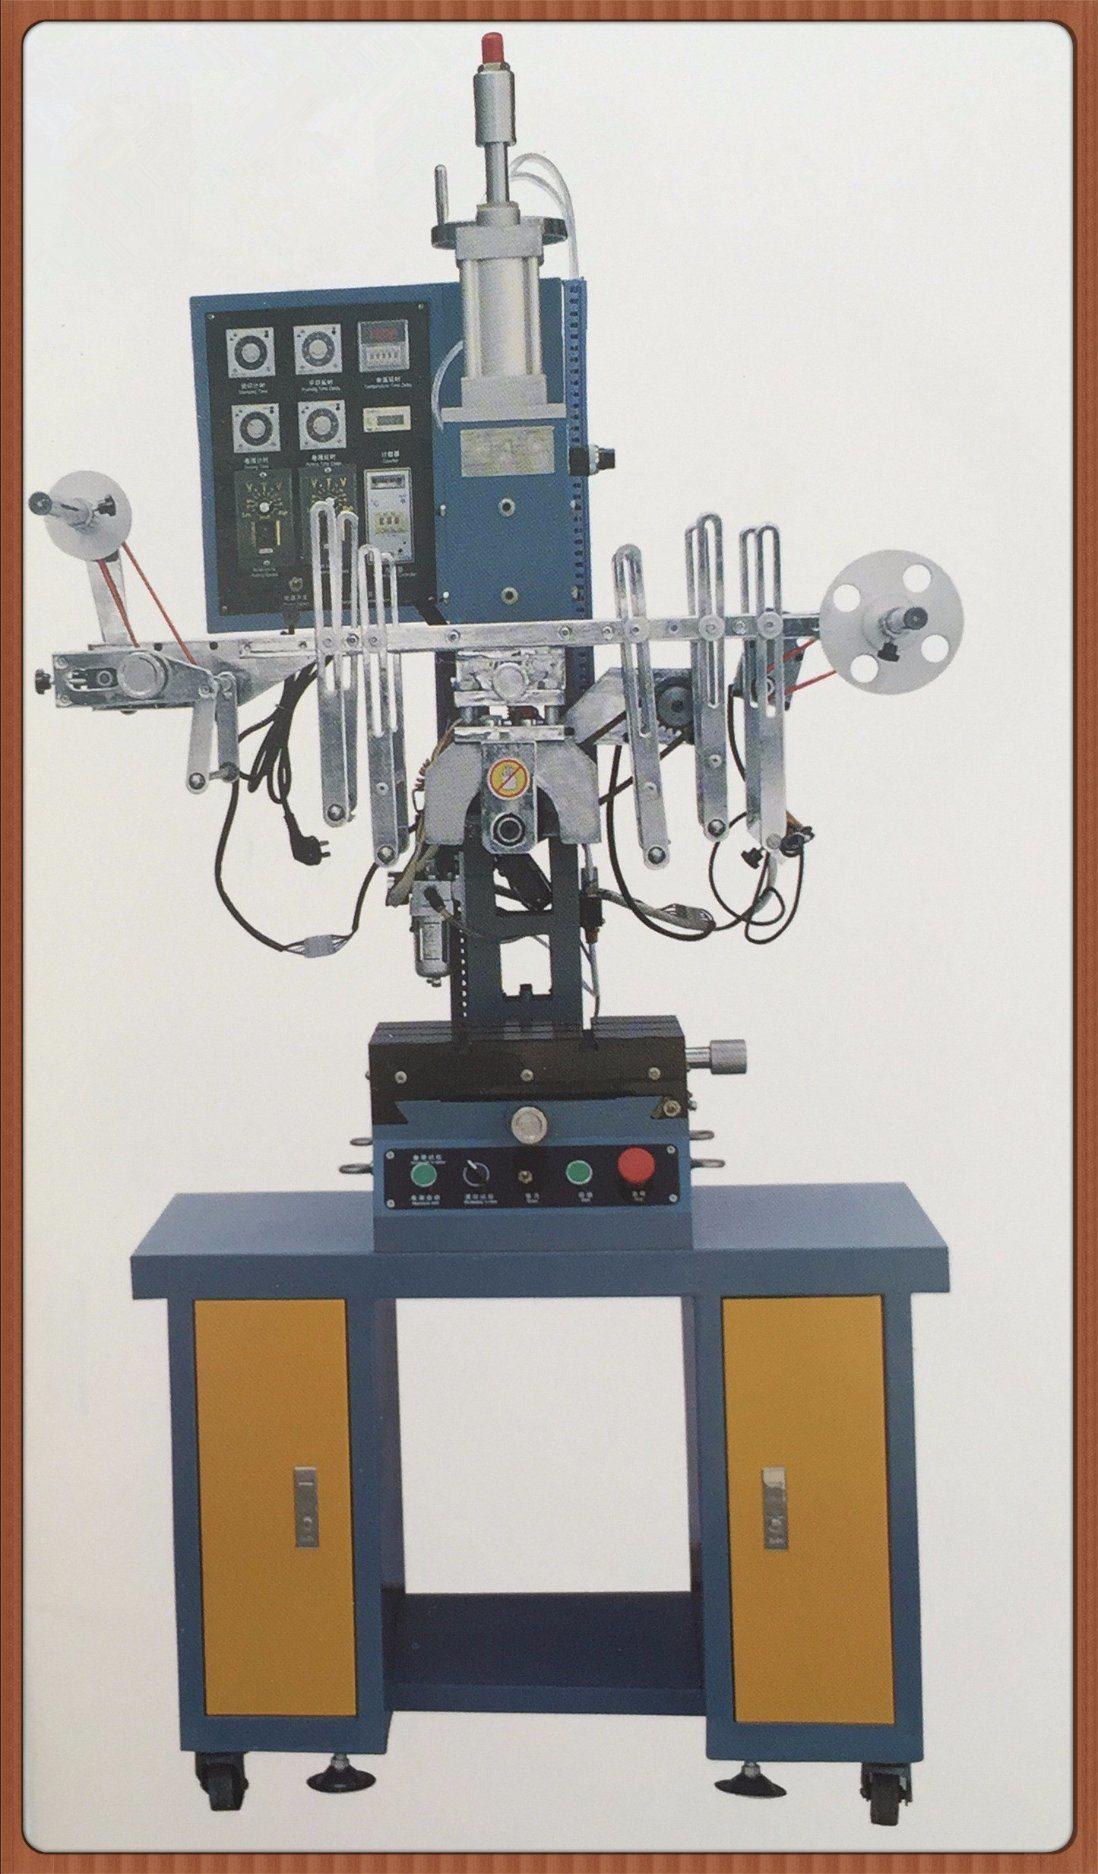 High Quality Heat Transfer Printing Machine GS2015